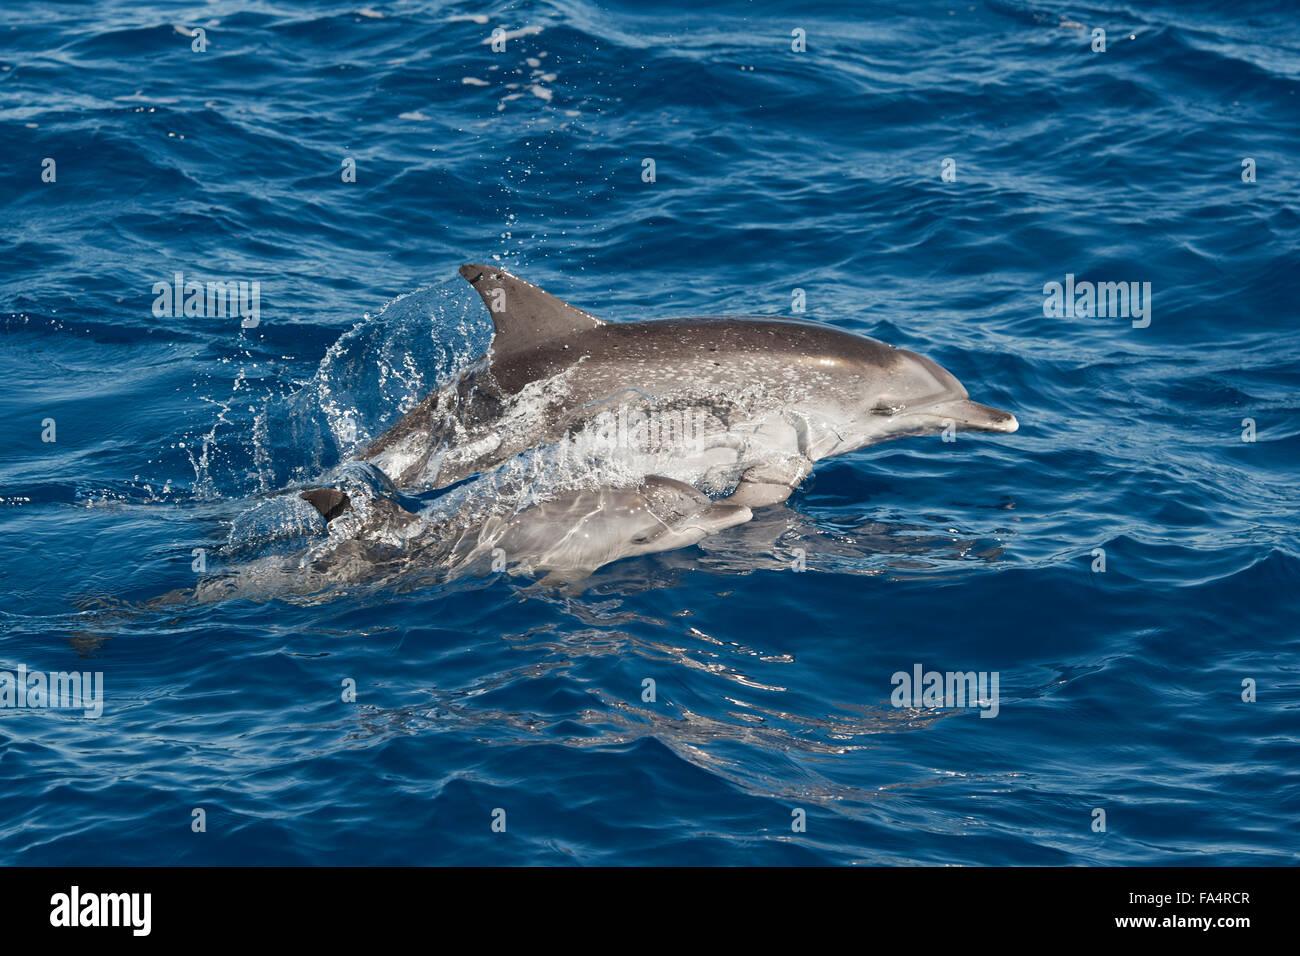 Atlantic Spotted Dolphin (Stenella frontalis), mother & calf porpoising, Azores, Atlantic Ocean. - Stock Image